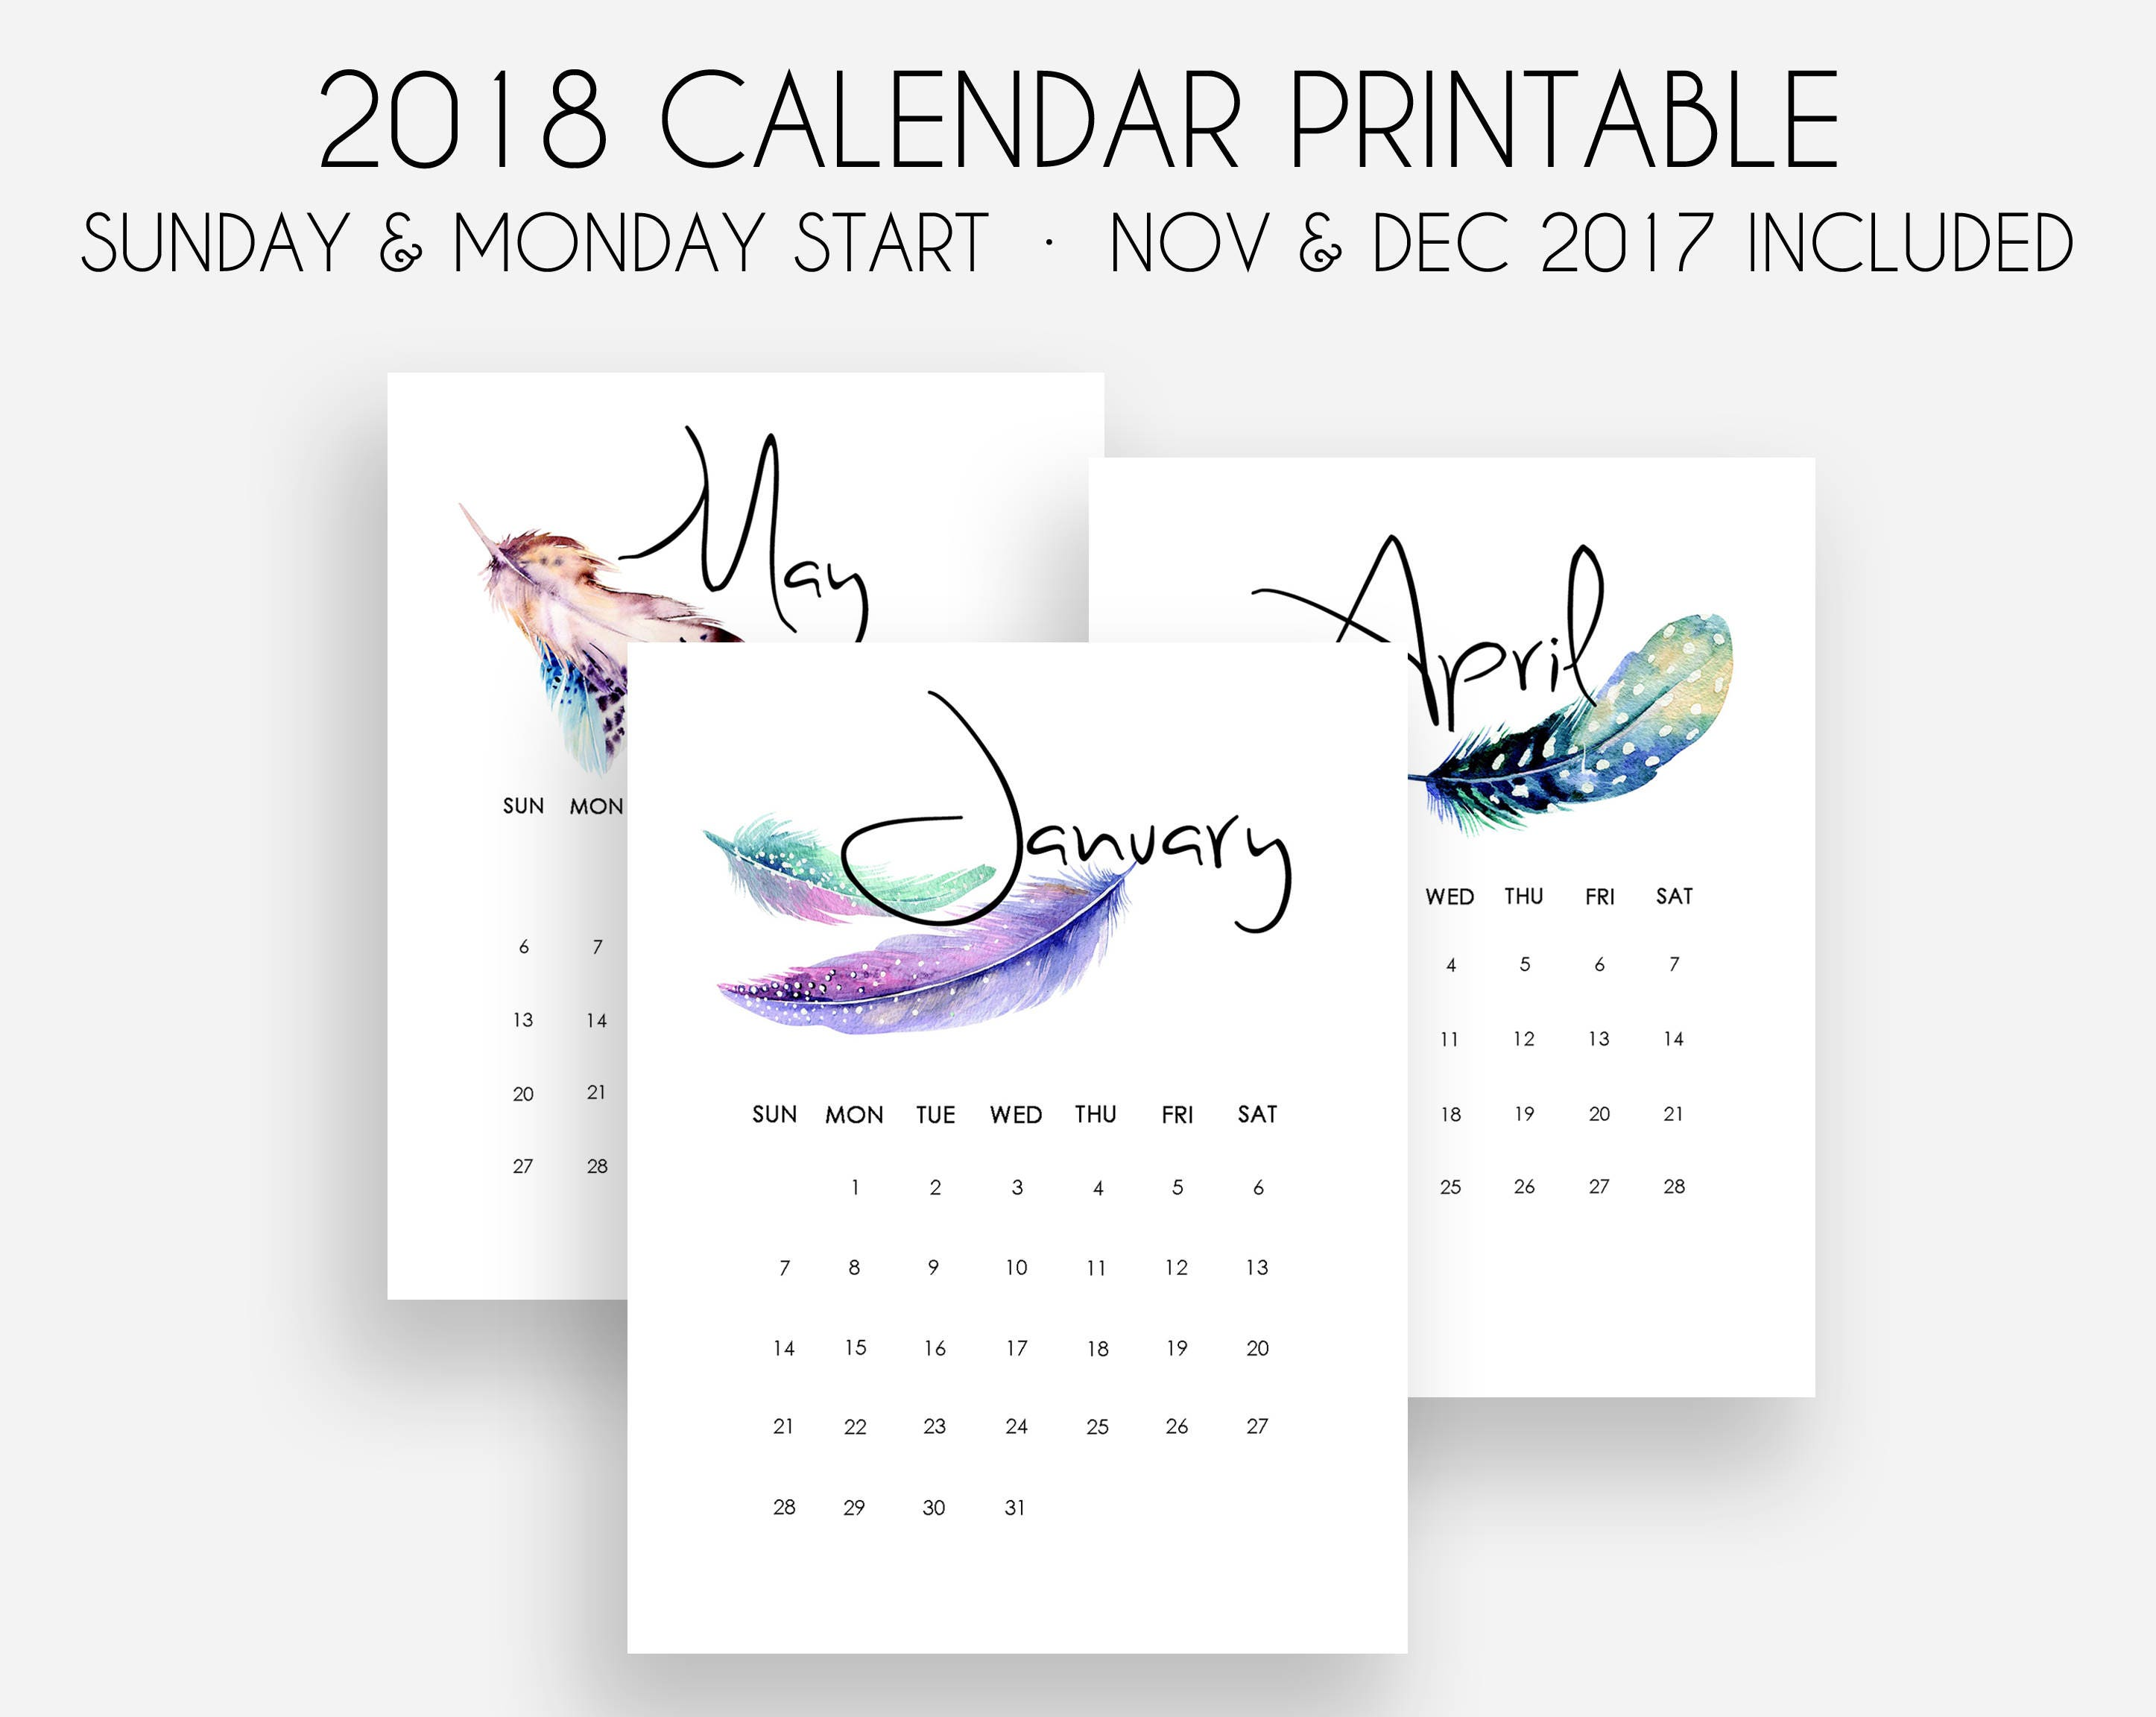 Printable 2018 Kalender Monats-Kalender 2018 Kalender